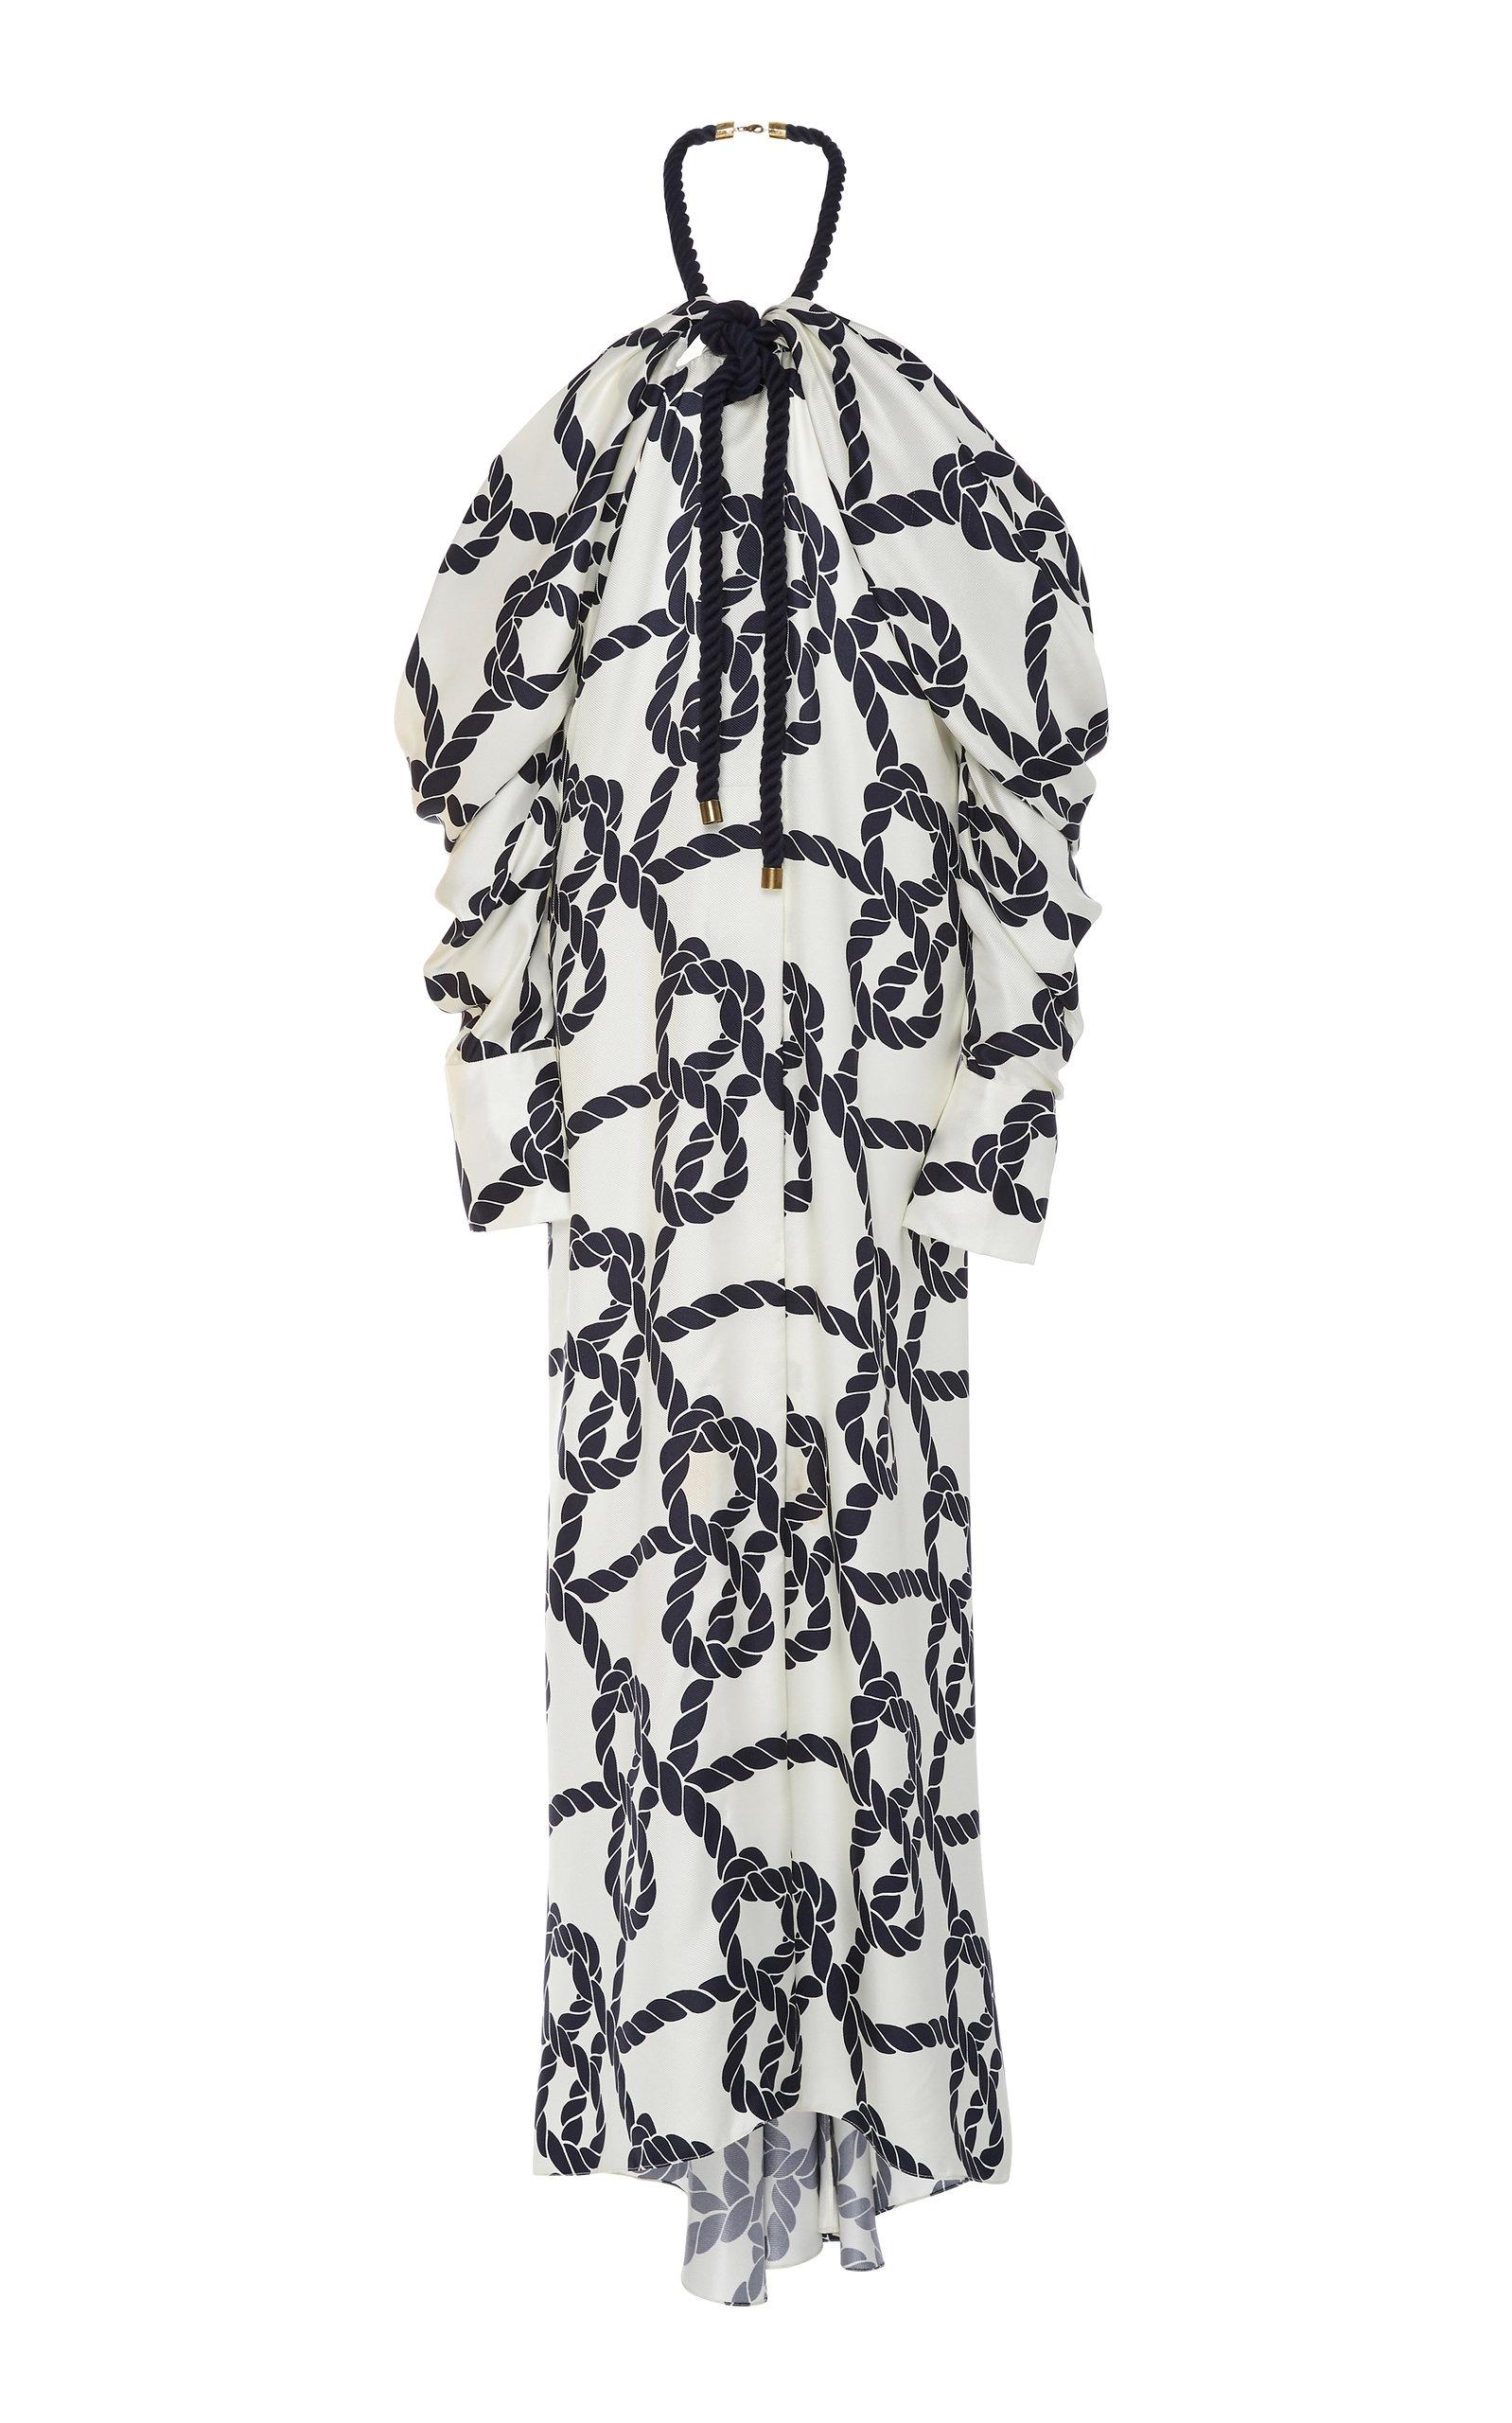 Monse COLD-SHOULDER PRINTED SILK-SATIN DRESS